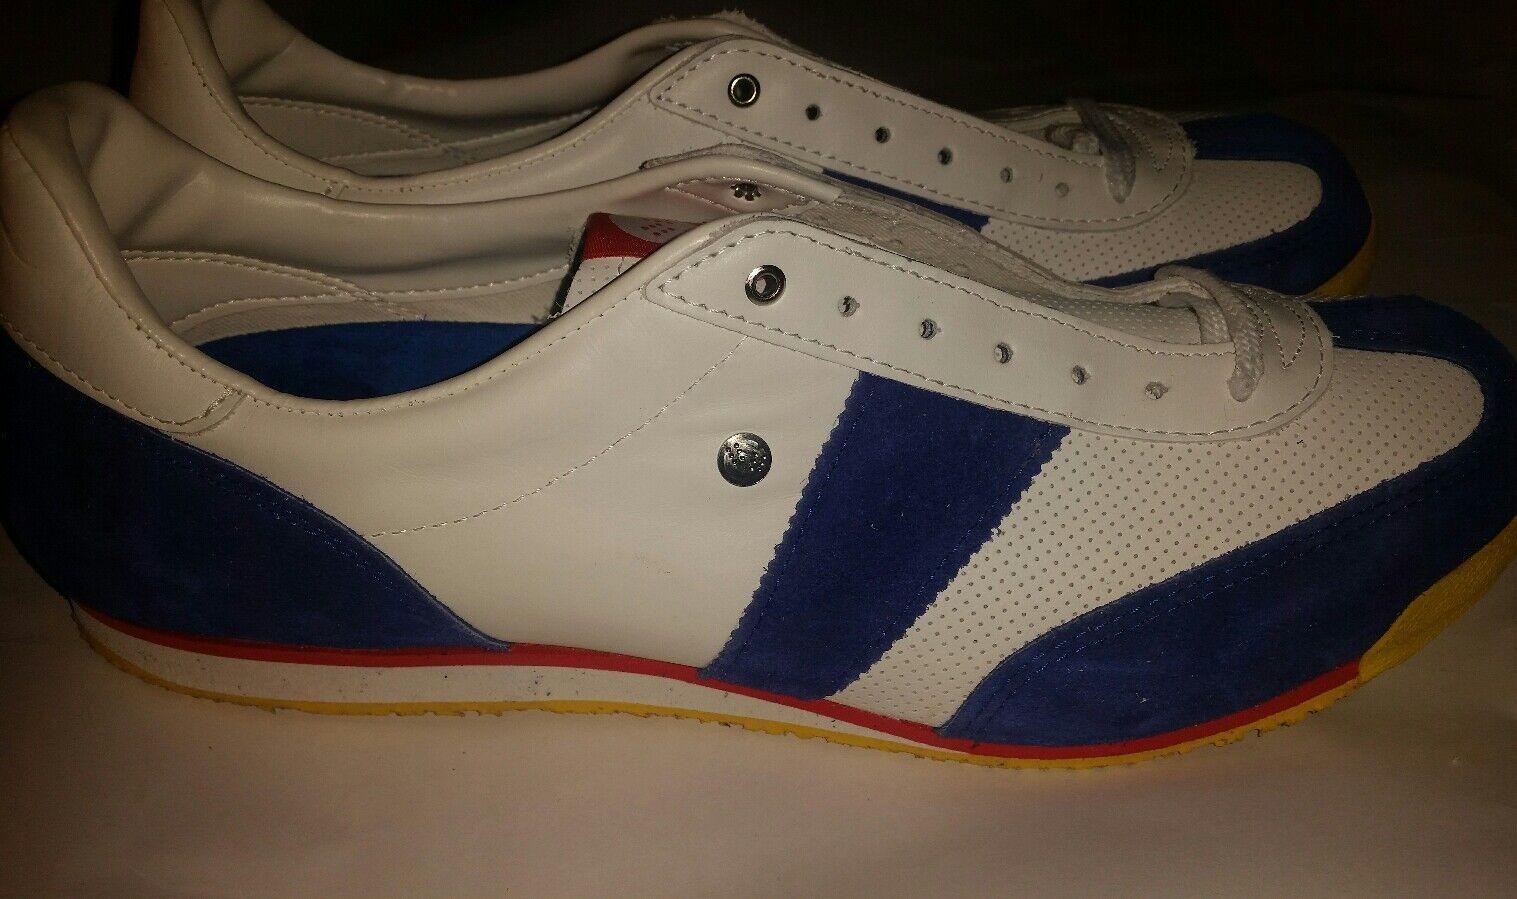 wholesale dealer 8b966 3b0d3 New Men s BOTAS 66 Size US 14 Sneakers bluee White